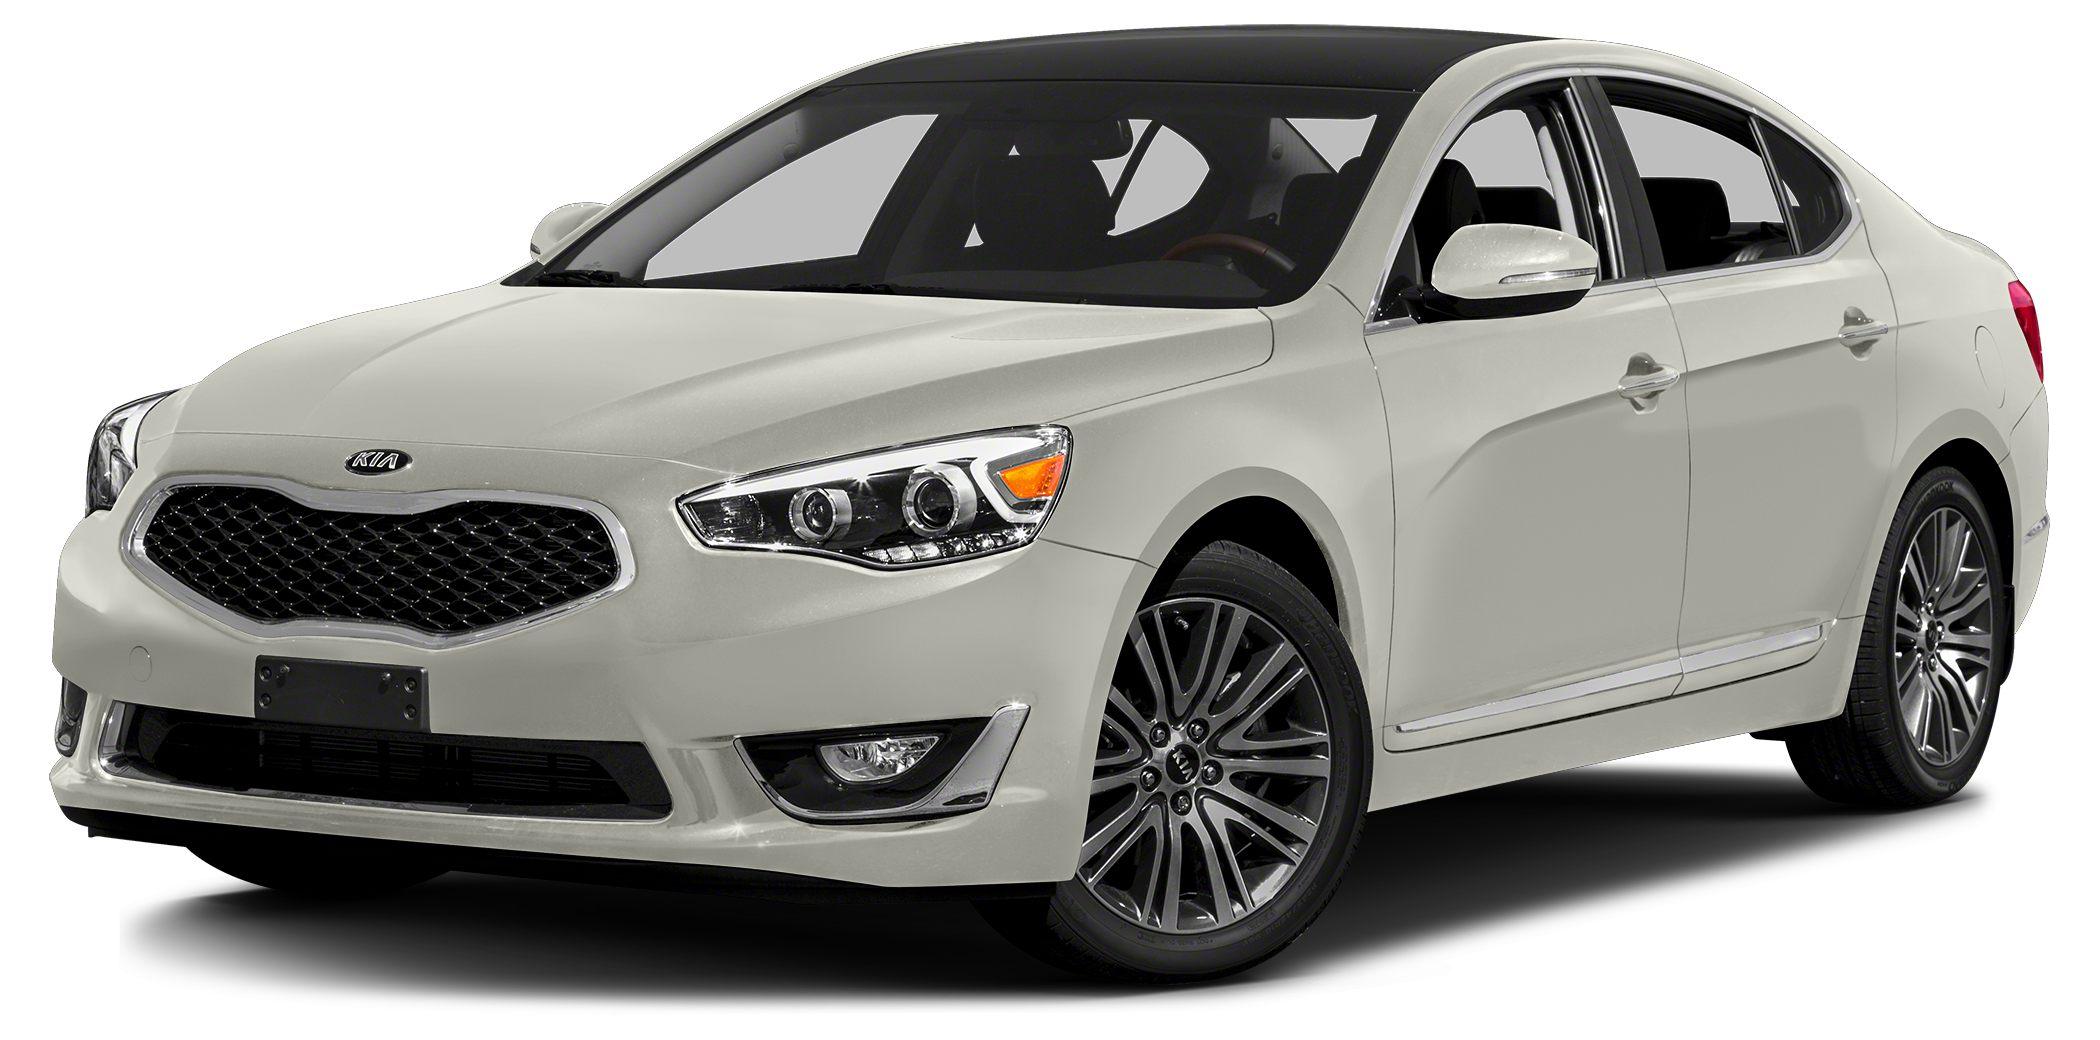 2014 Kia Cadenza Premium Miles 41353Color Snow White Pearl Stock 121603 VIN KNALN4D72E512160